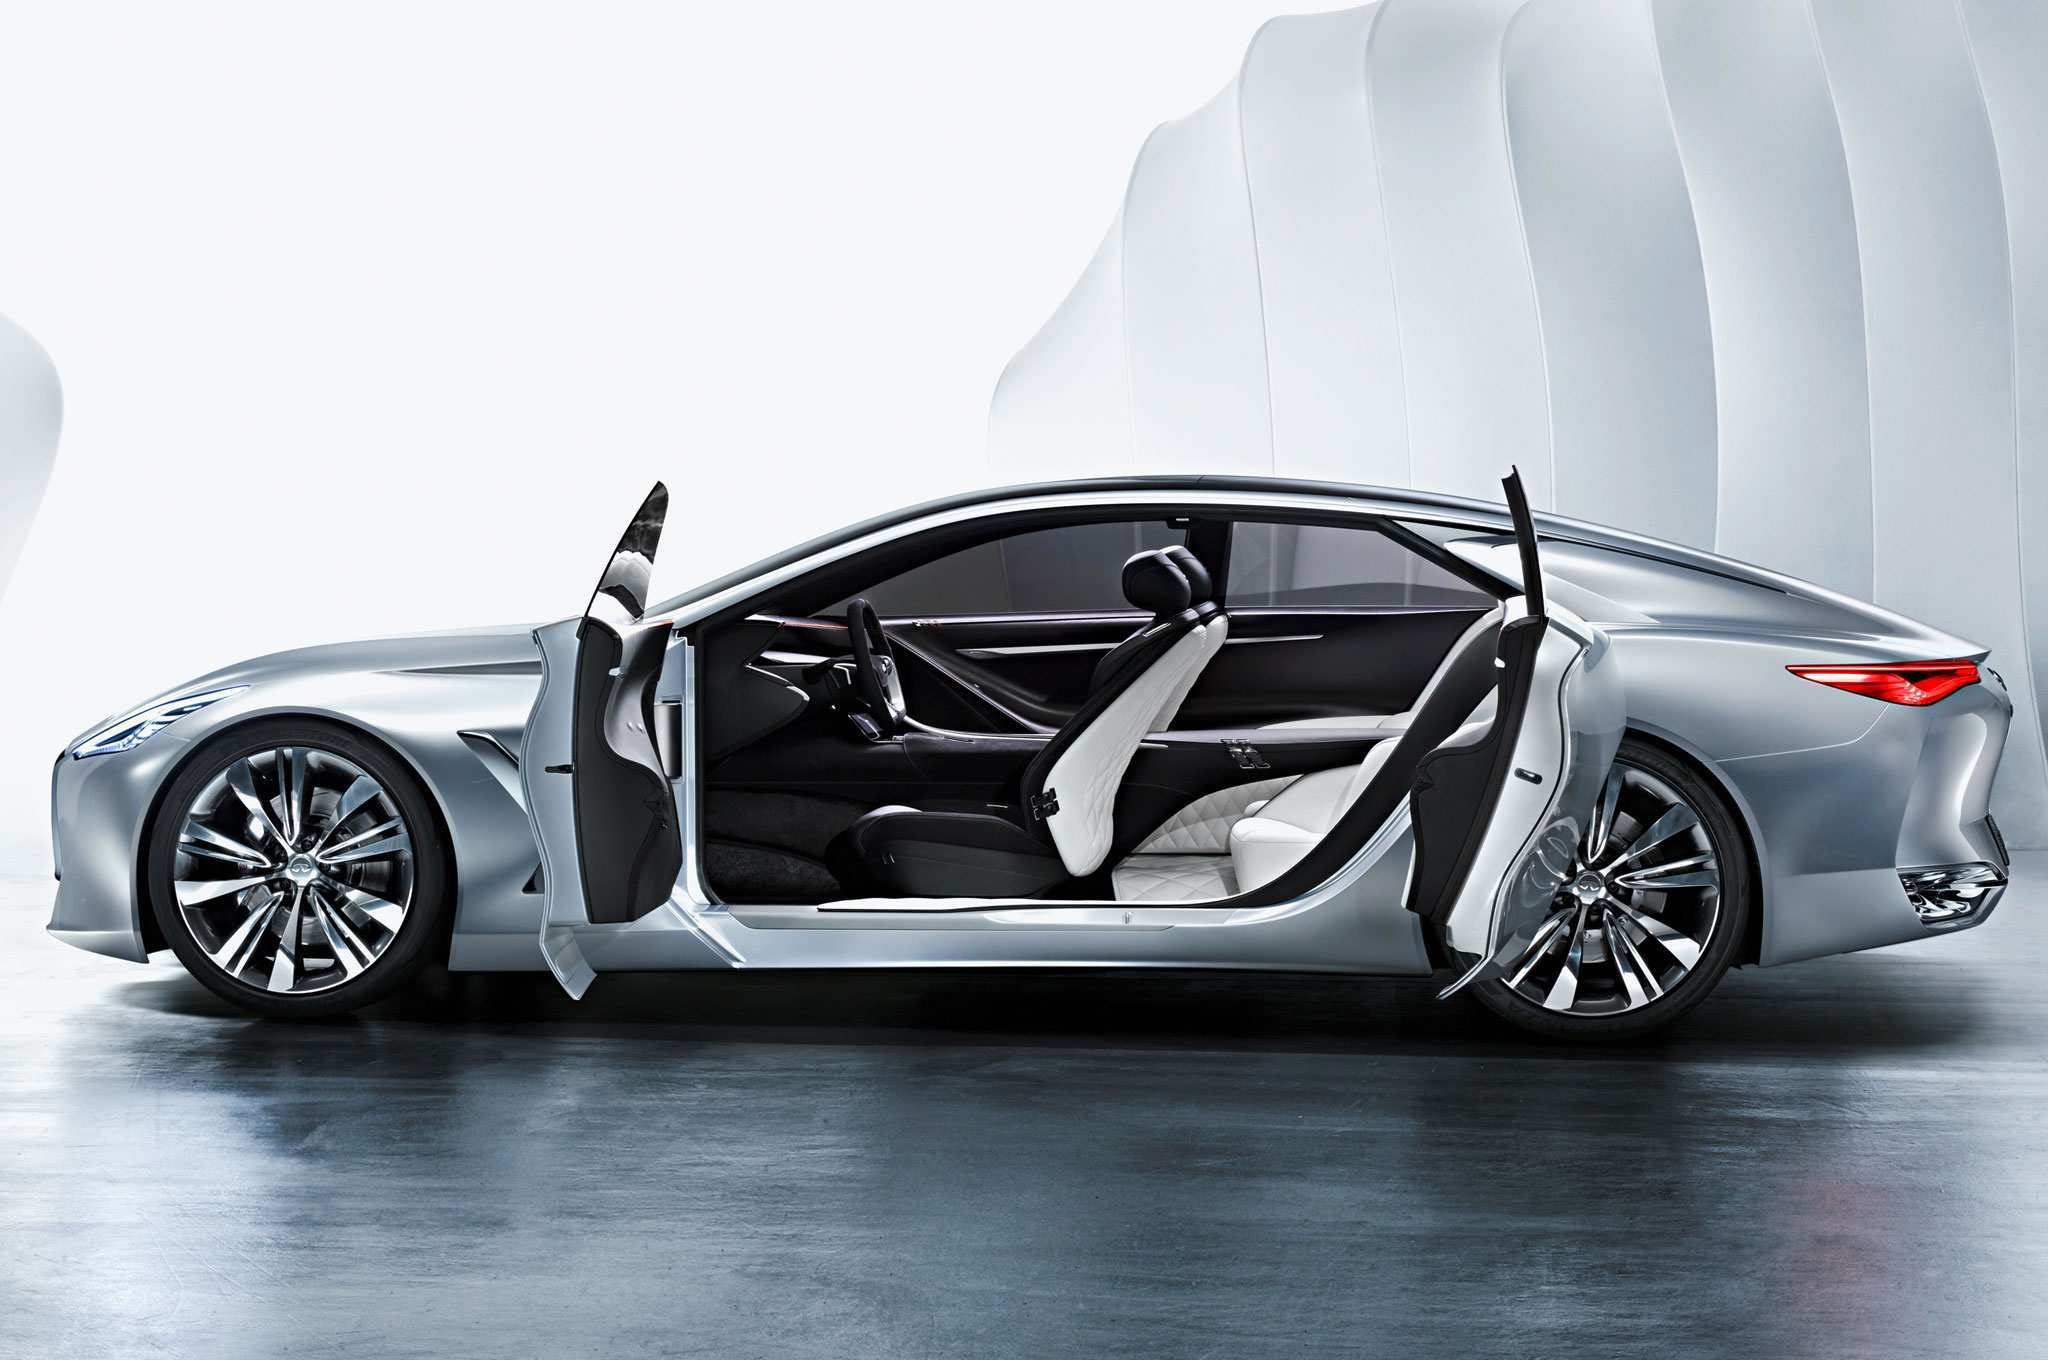 26 All New 2020 Infiniti Q80 Sedan Redesign for 2020 Infiniti Q80 Sedan